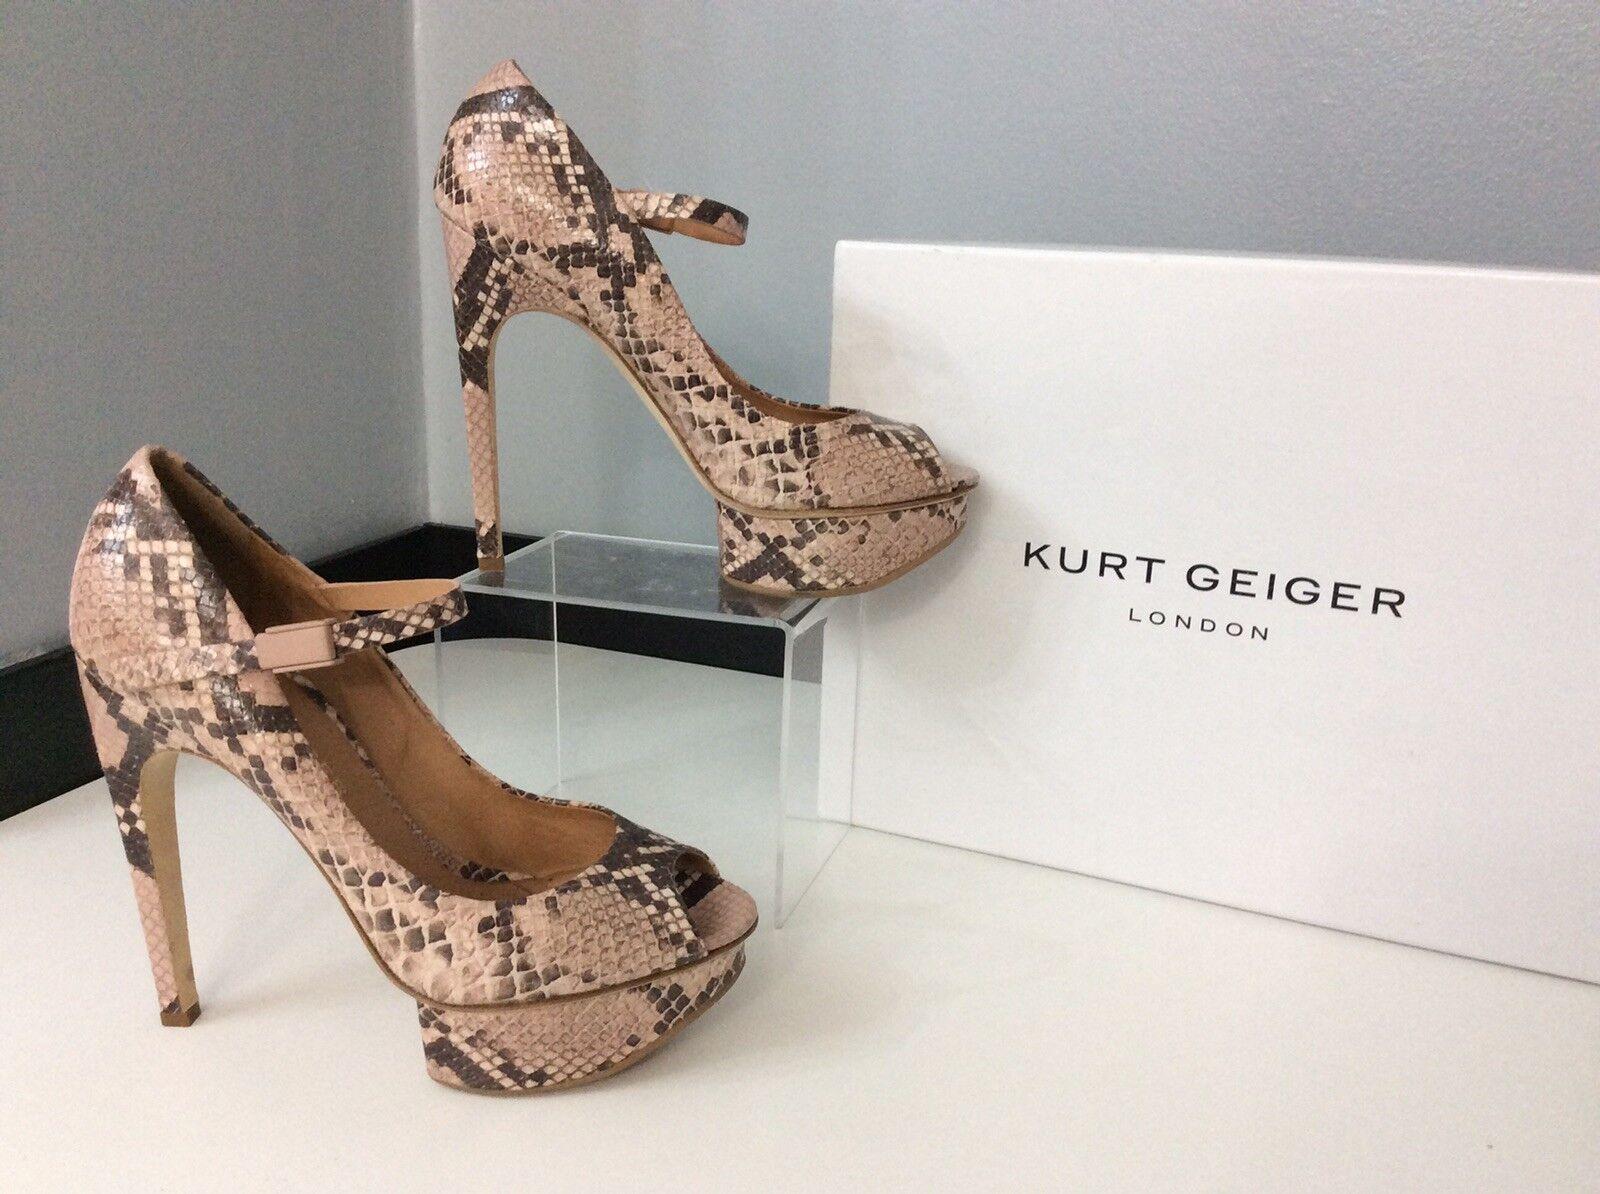 Kurt Geiger KG Taille 39 UK 6 cabalah Peep Toe chaussures en cuir très bon état